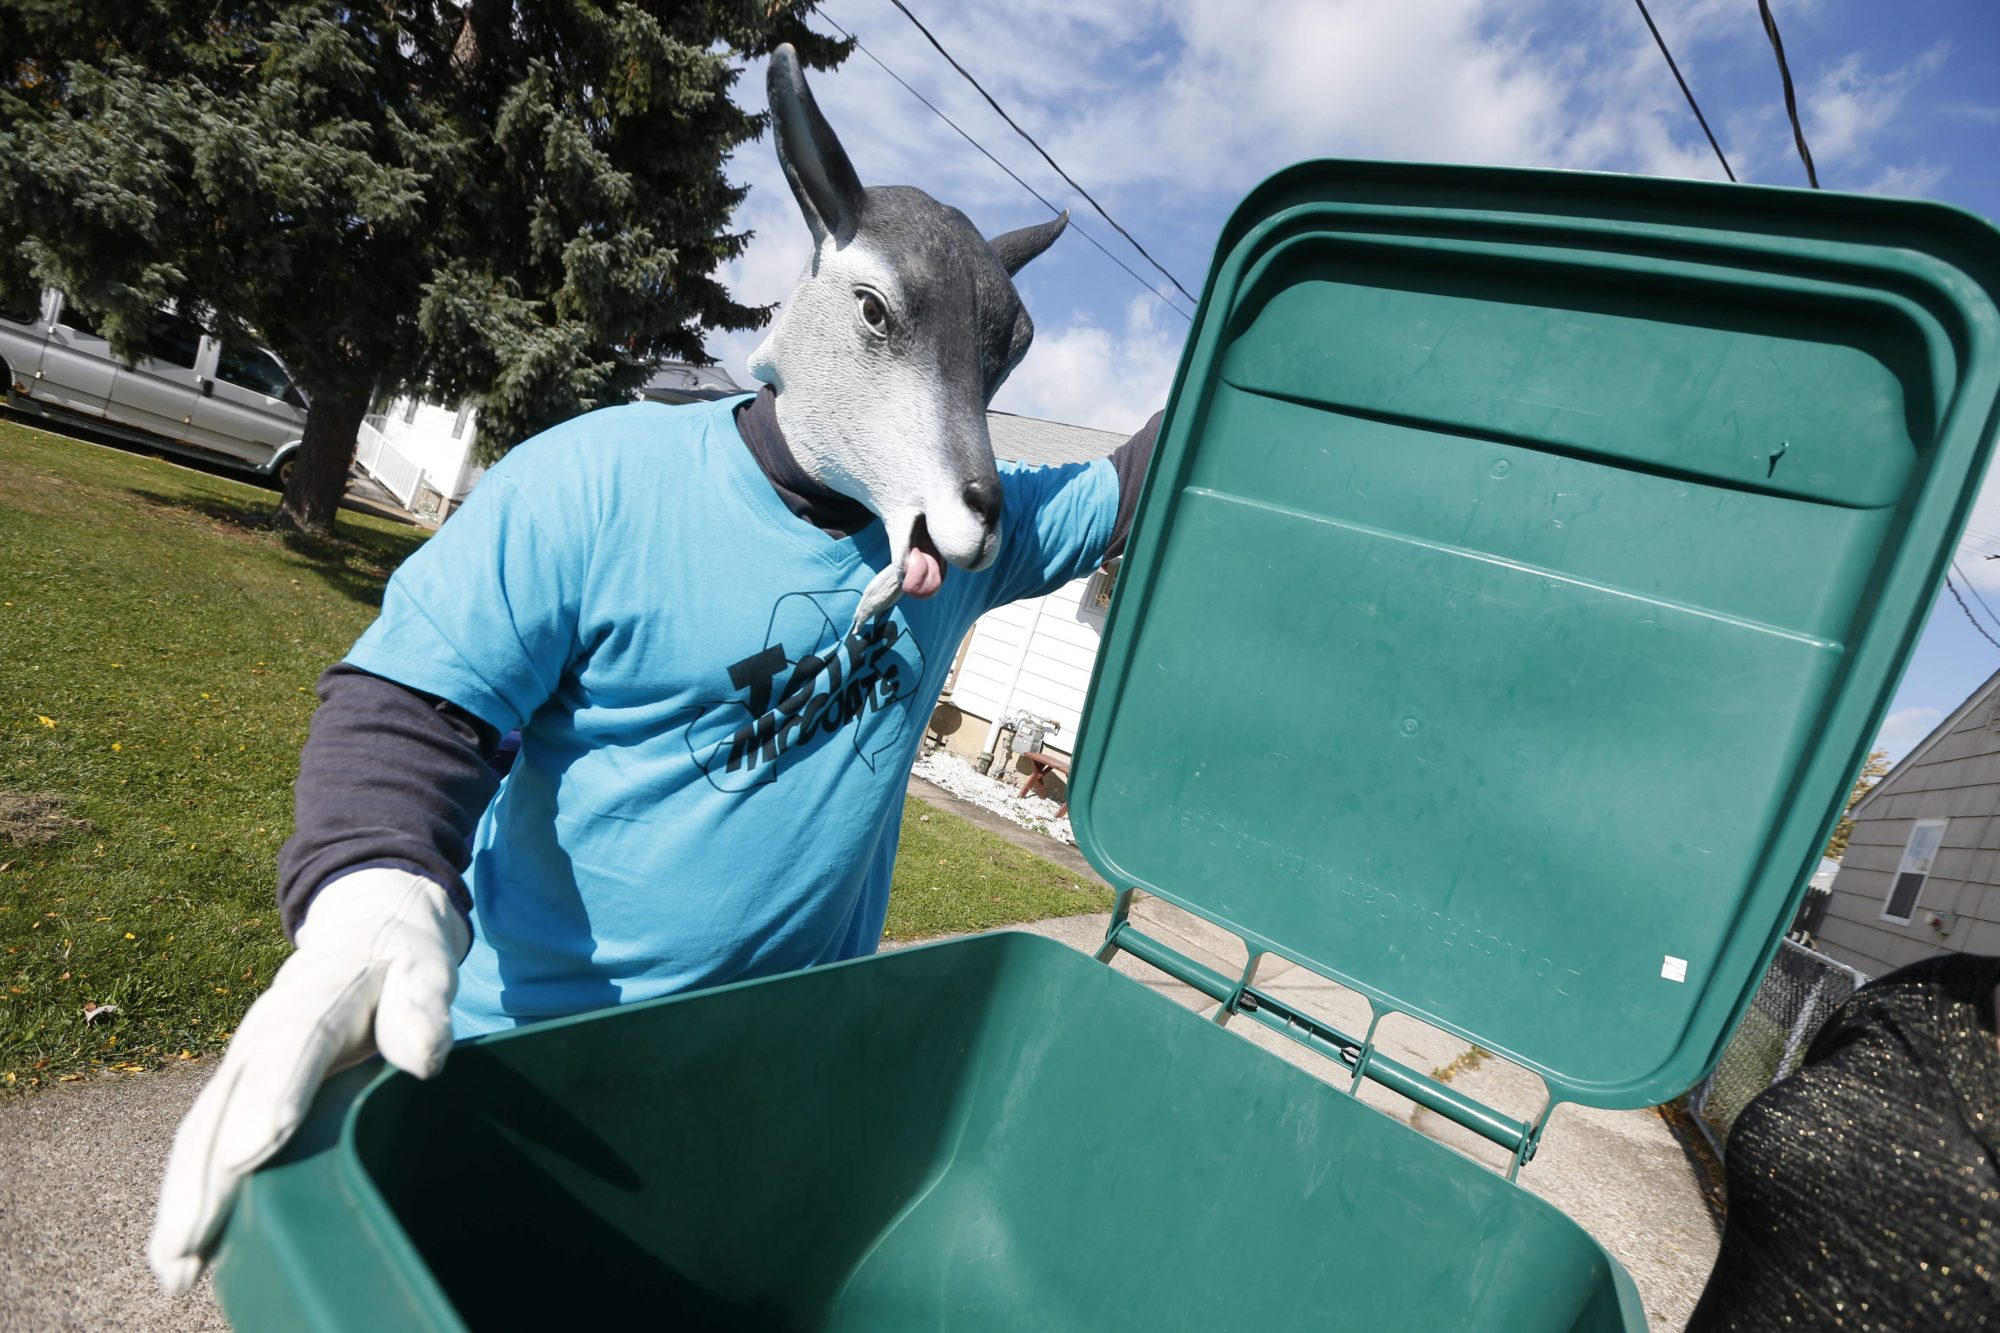 Niagara Falls garbage mascot Totes McGoats displays one of the city's garbage totes in this 2015 file photo. (Robert Kirkham/Buffalo News file photo)